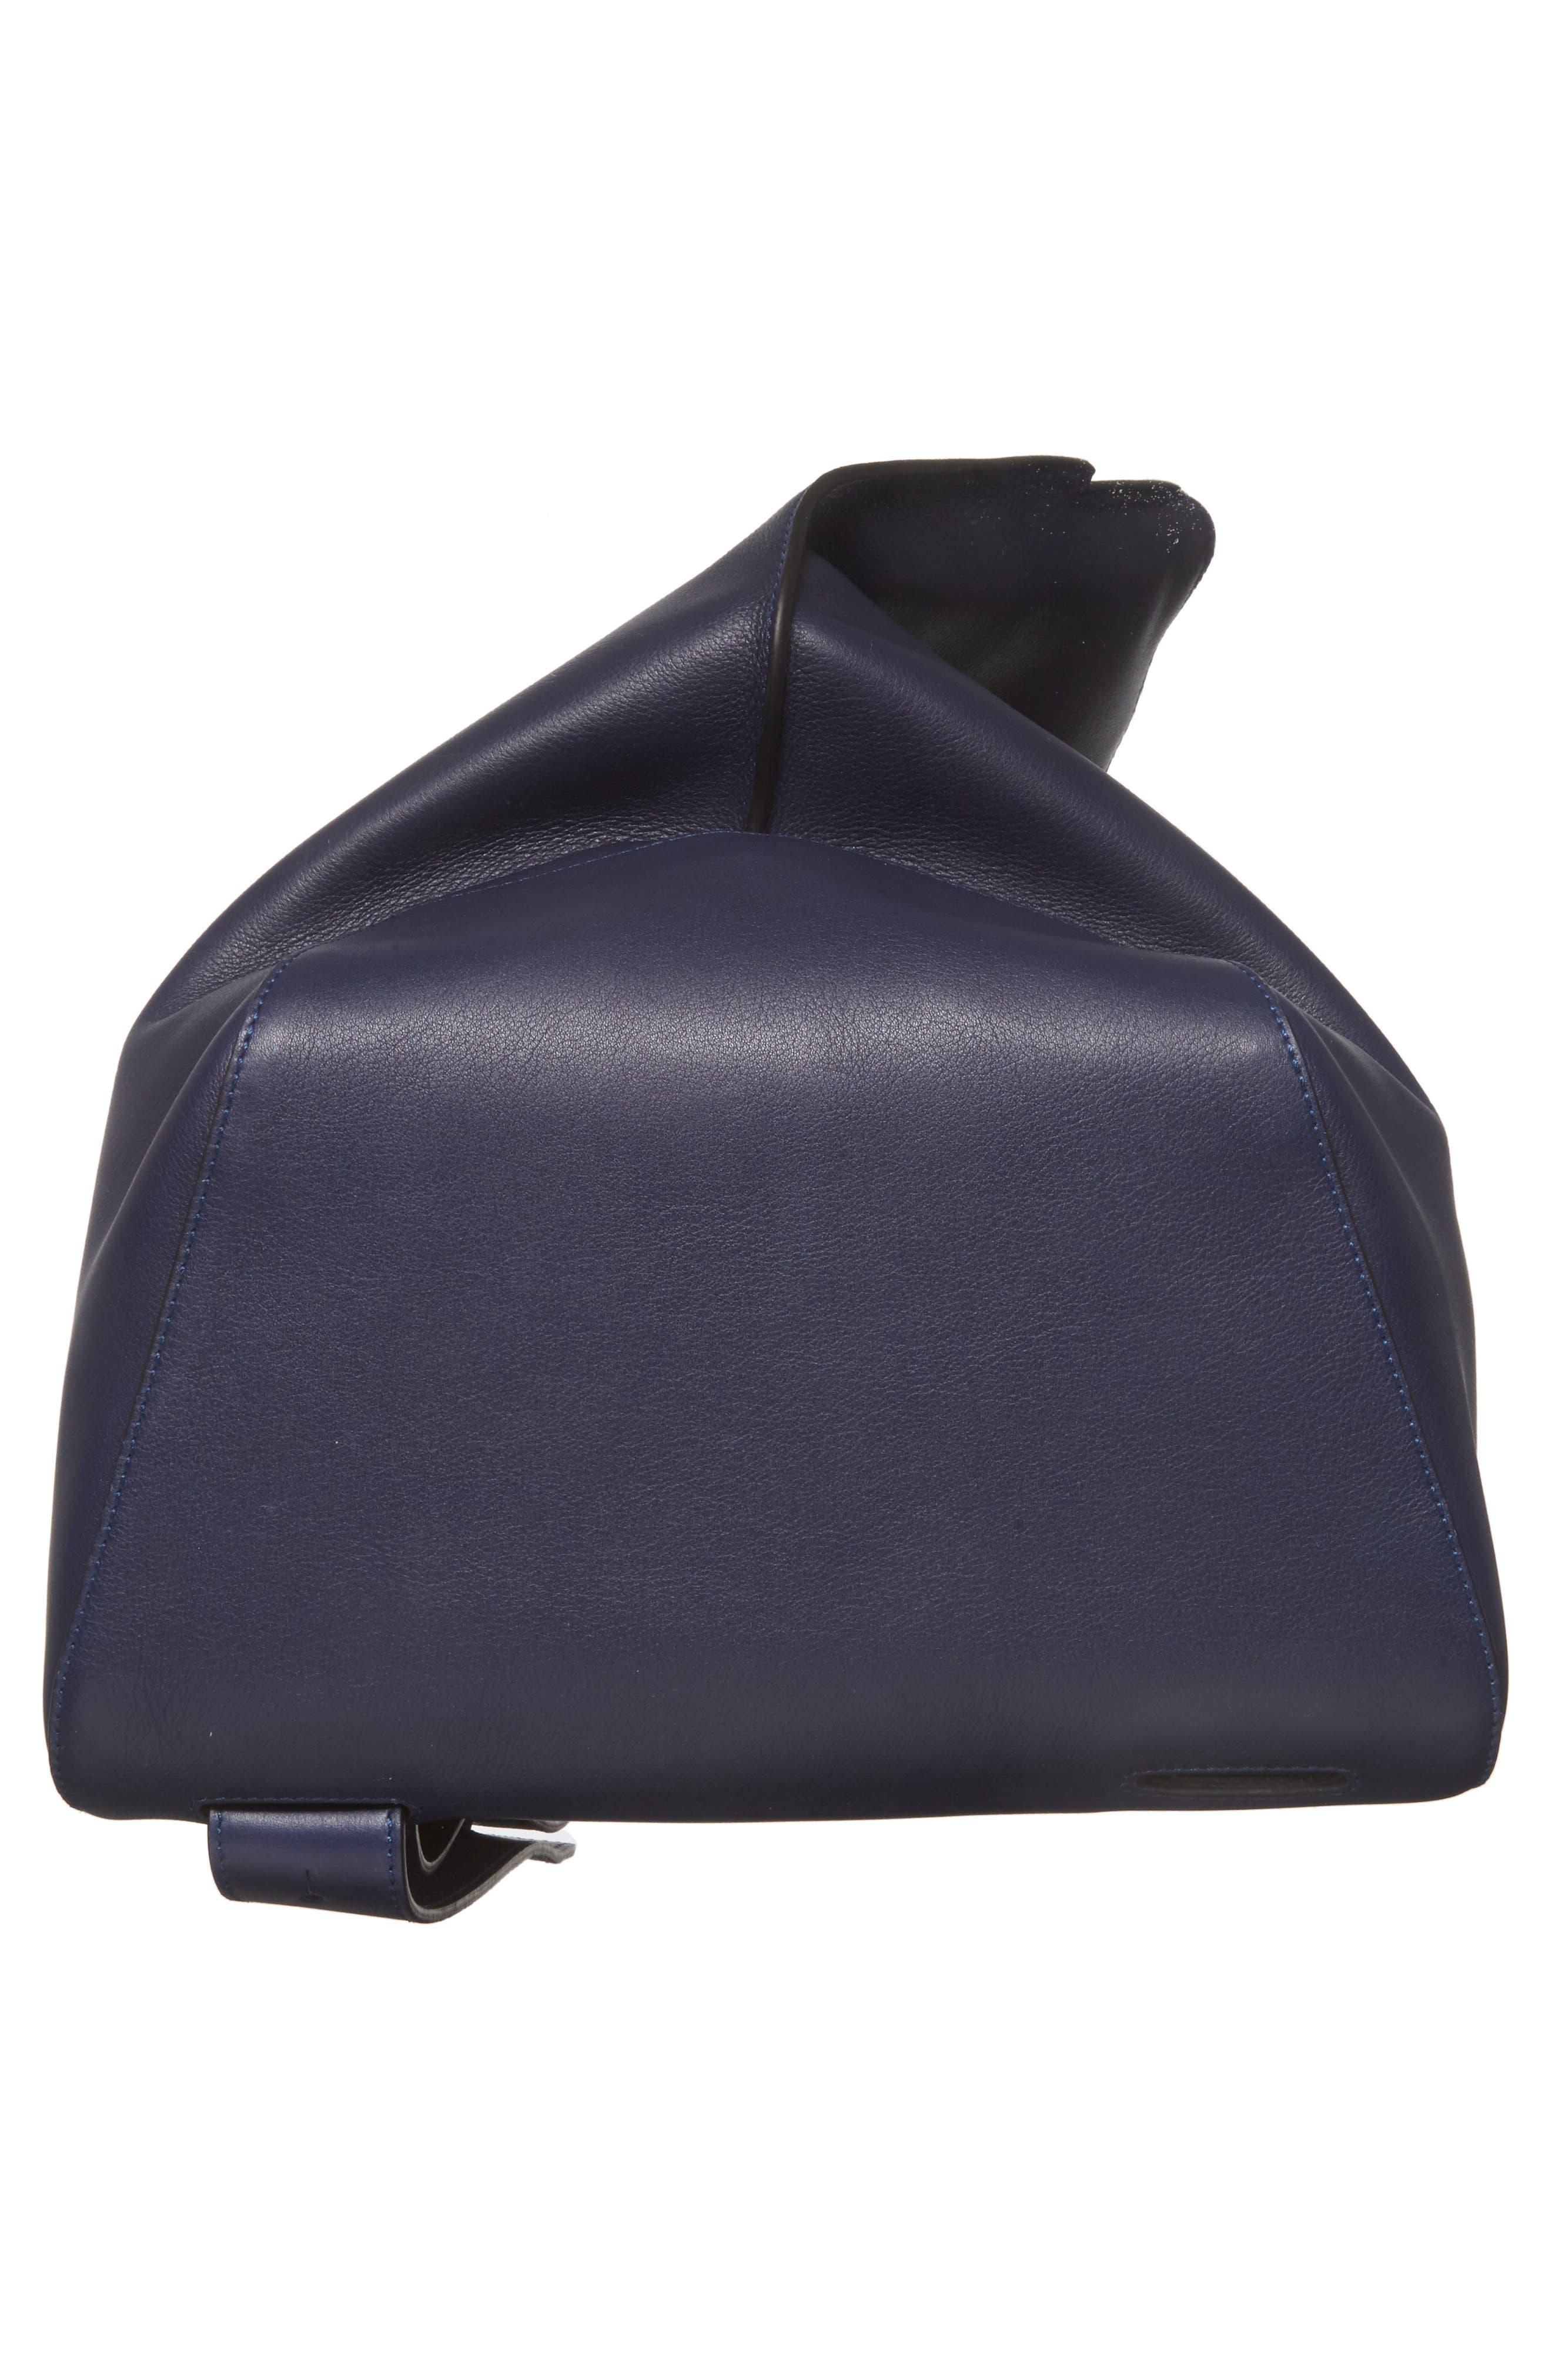 Anton Leather Sling Pack,                             Alternate thumbnail 6, color,                             NAVY BLUE